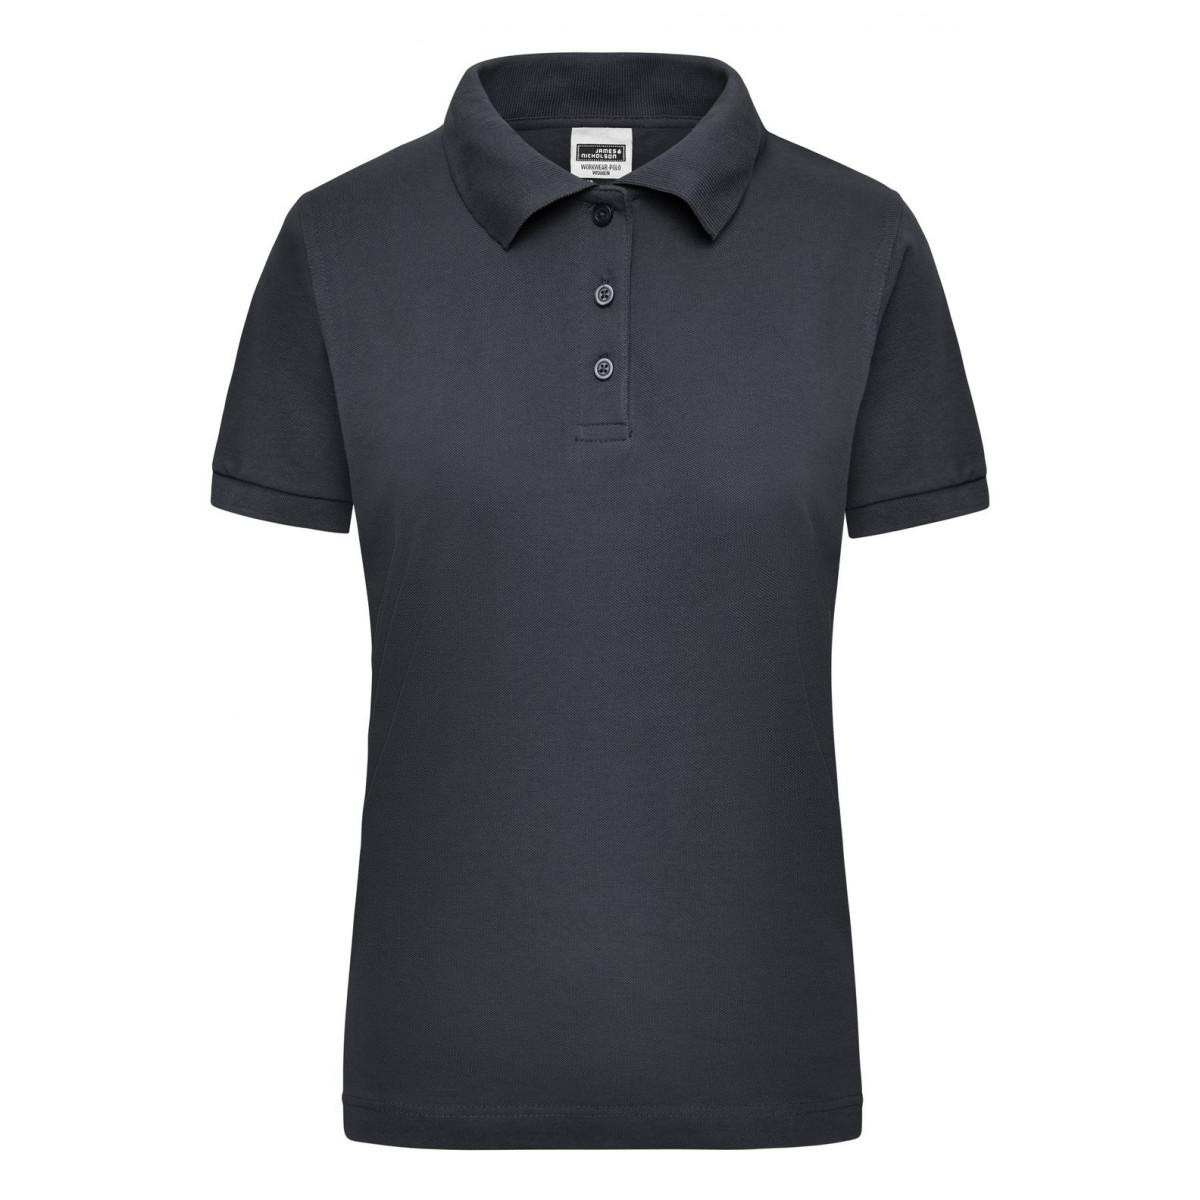 Рубашка поло мужская JN803 Workwear Polo Women - Карбон